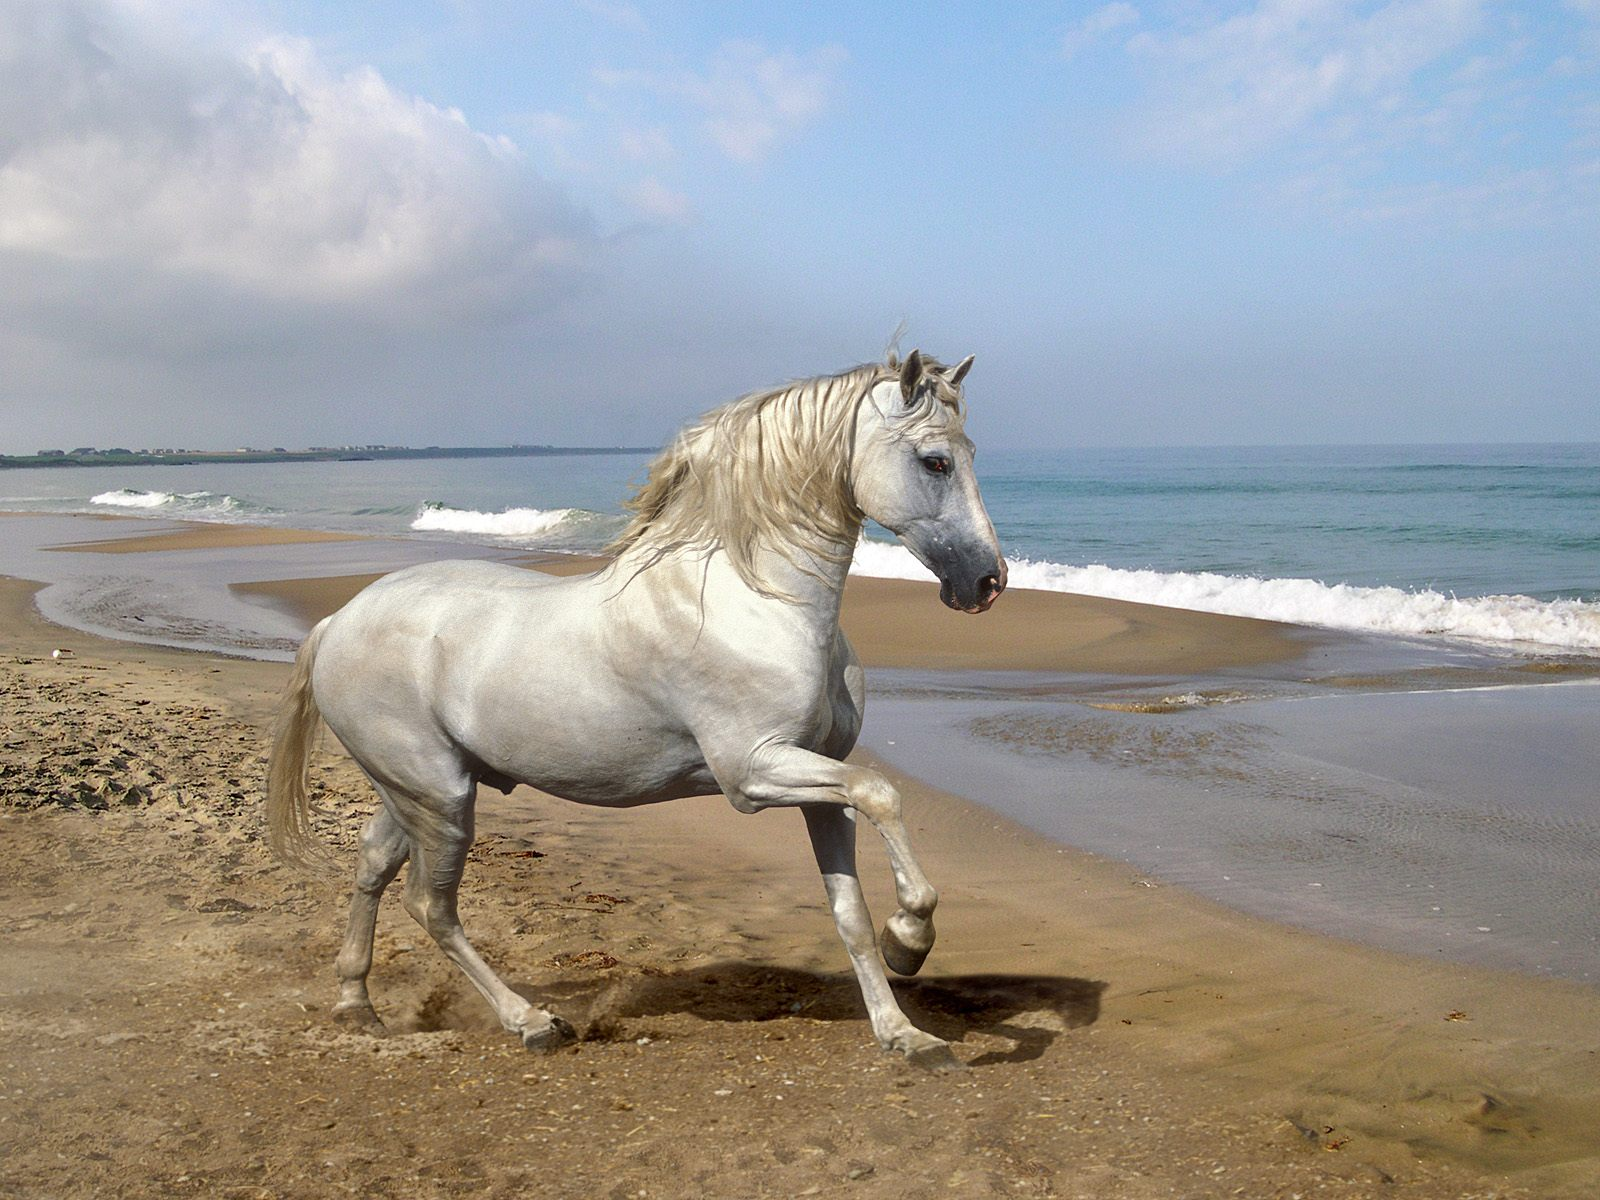 Great Wallpaper Horse Vintage - white-horse-on-beach  HD_258849.jpg